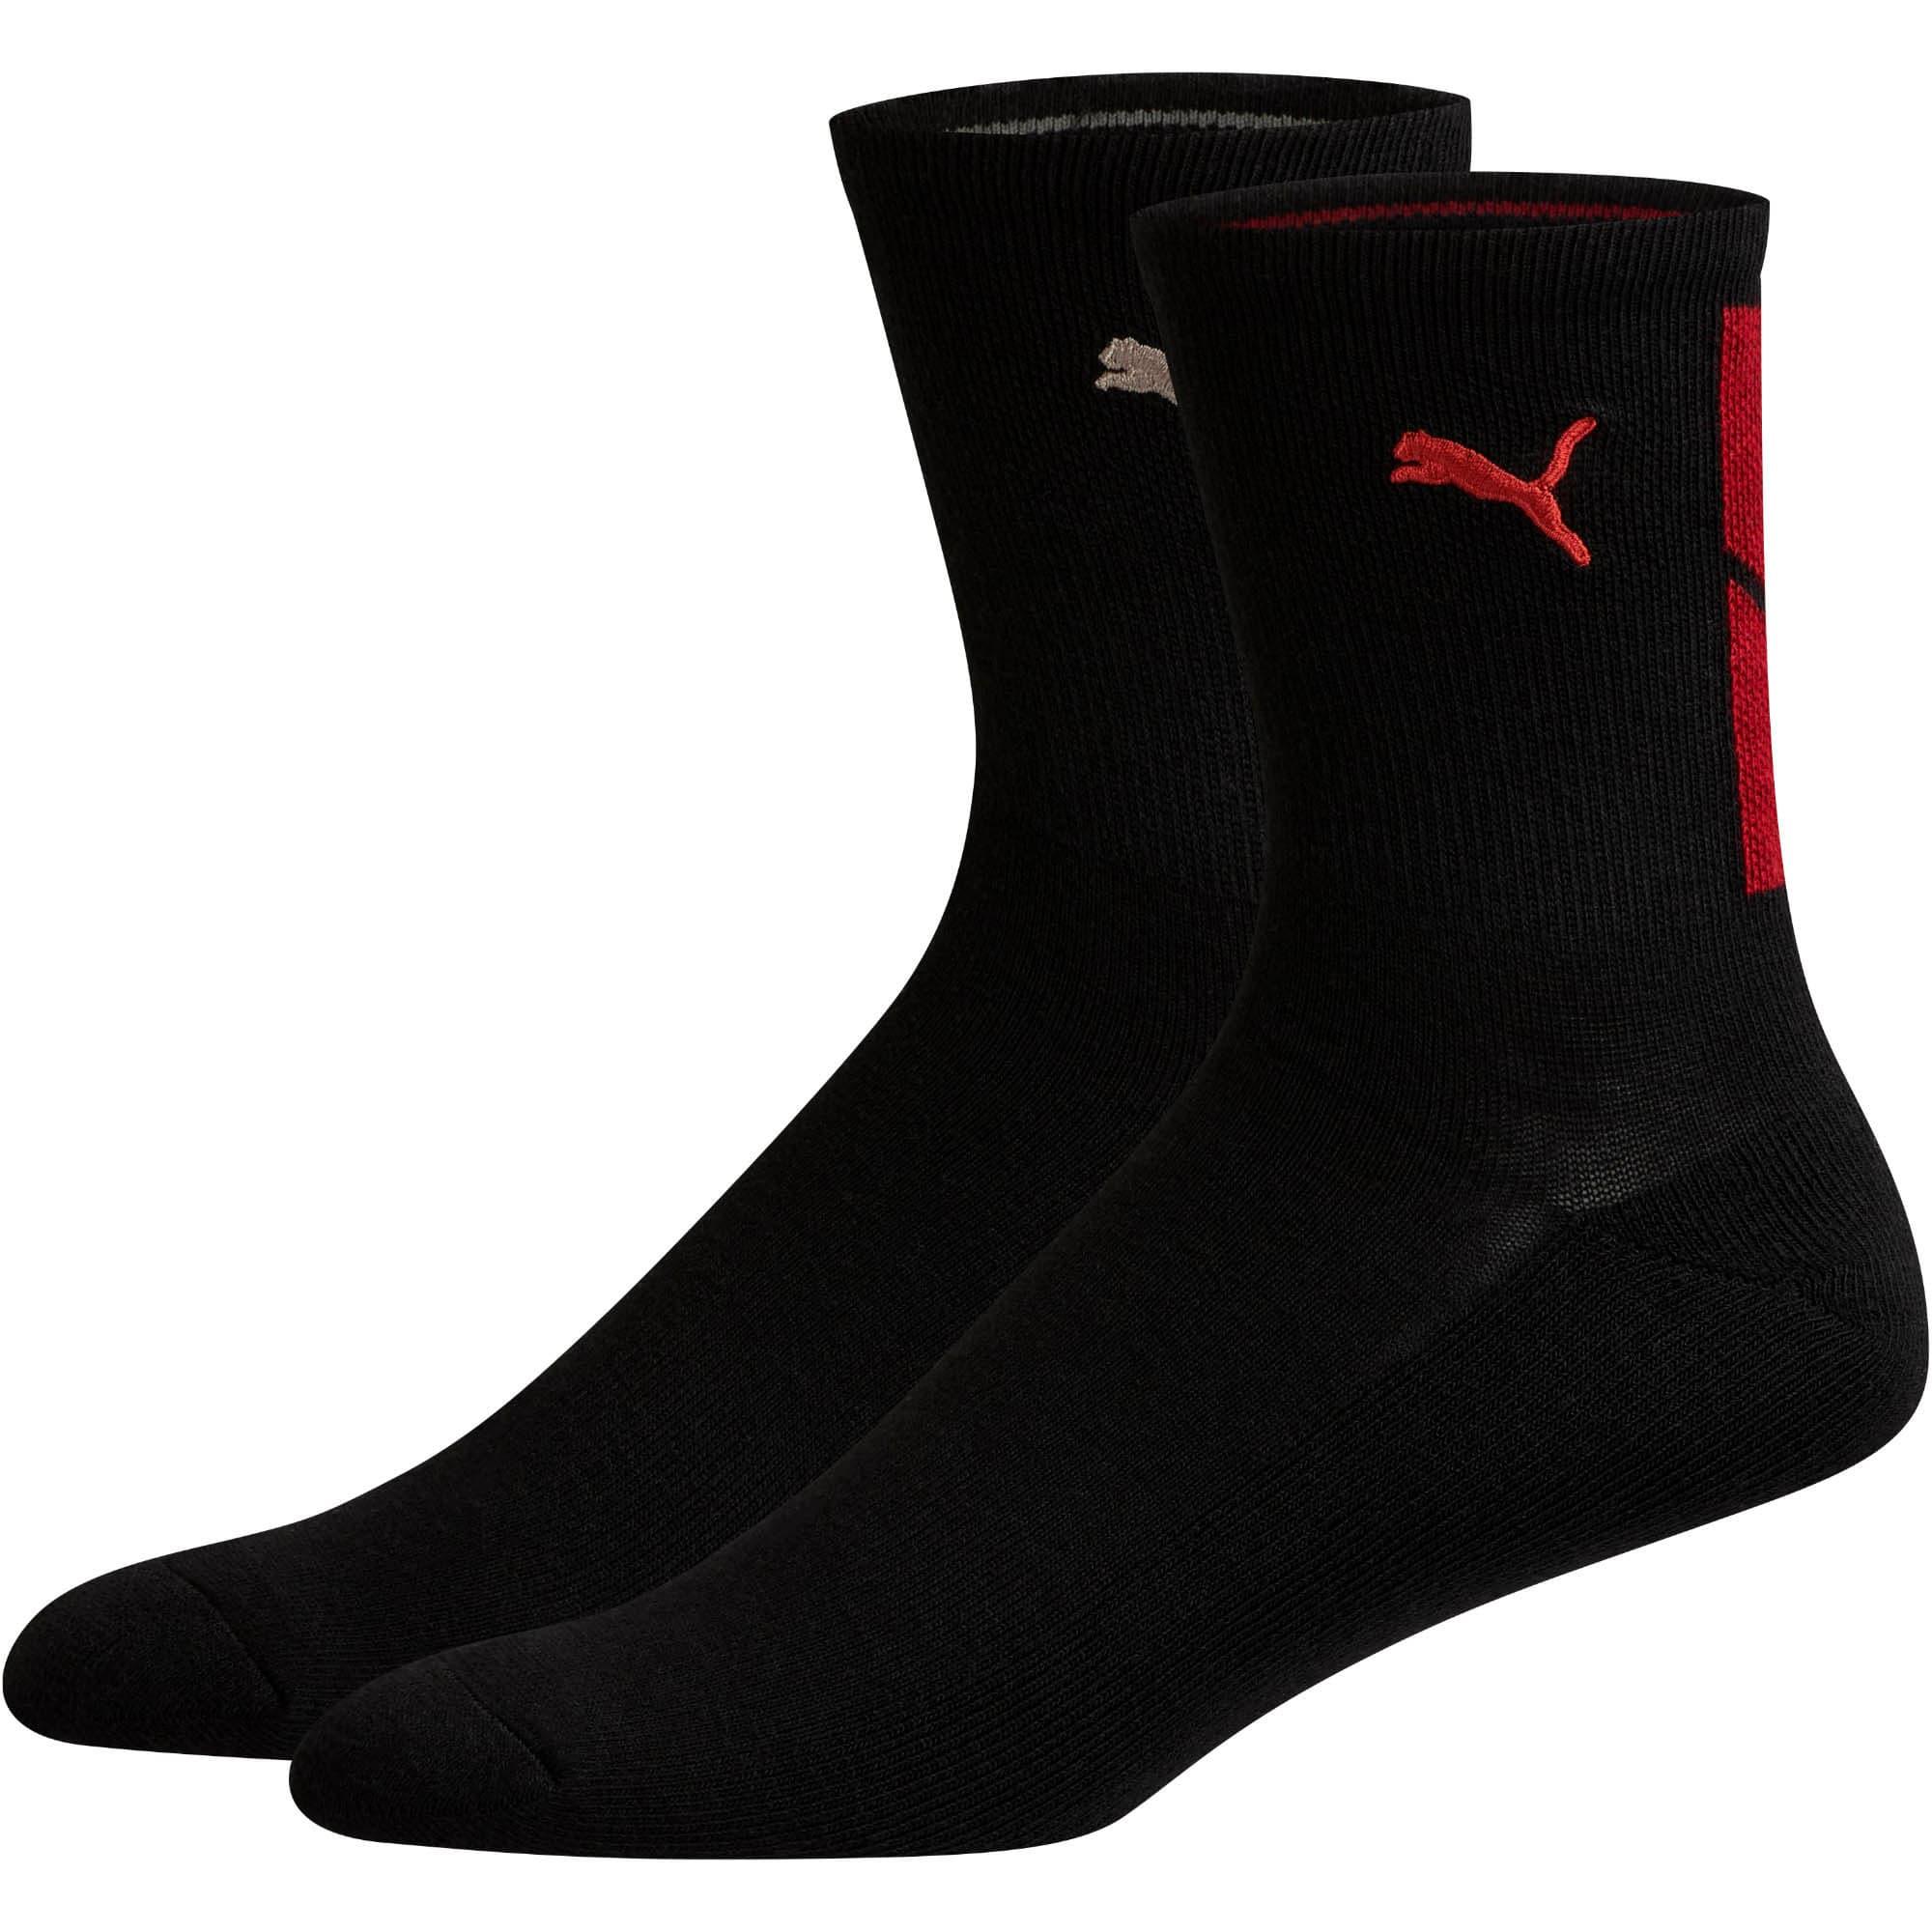 Thumbnail 1 of Men's Low Crew Socks [2 Pack], BLACK / RED, medium